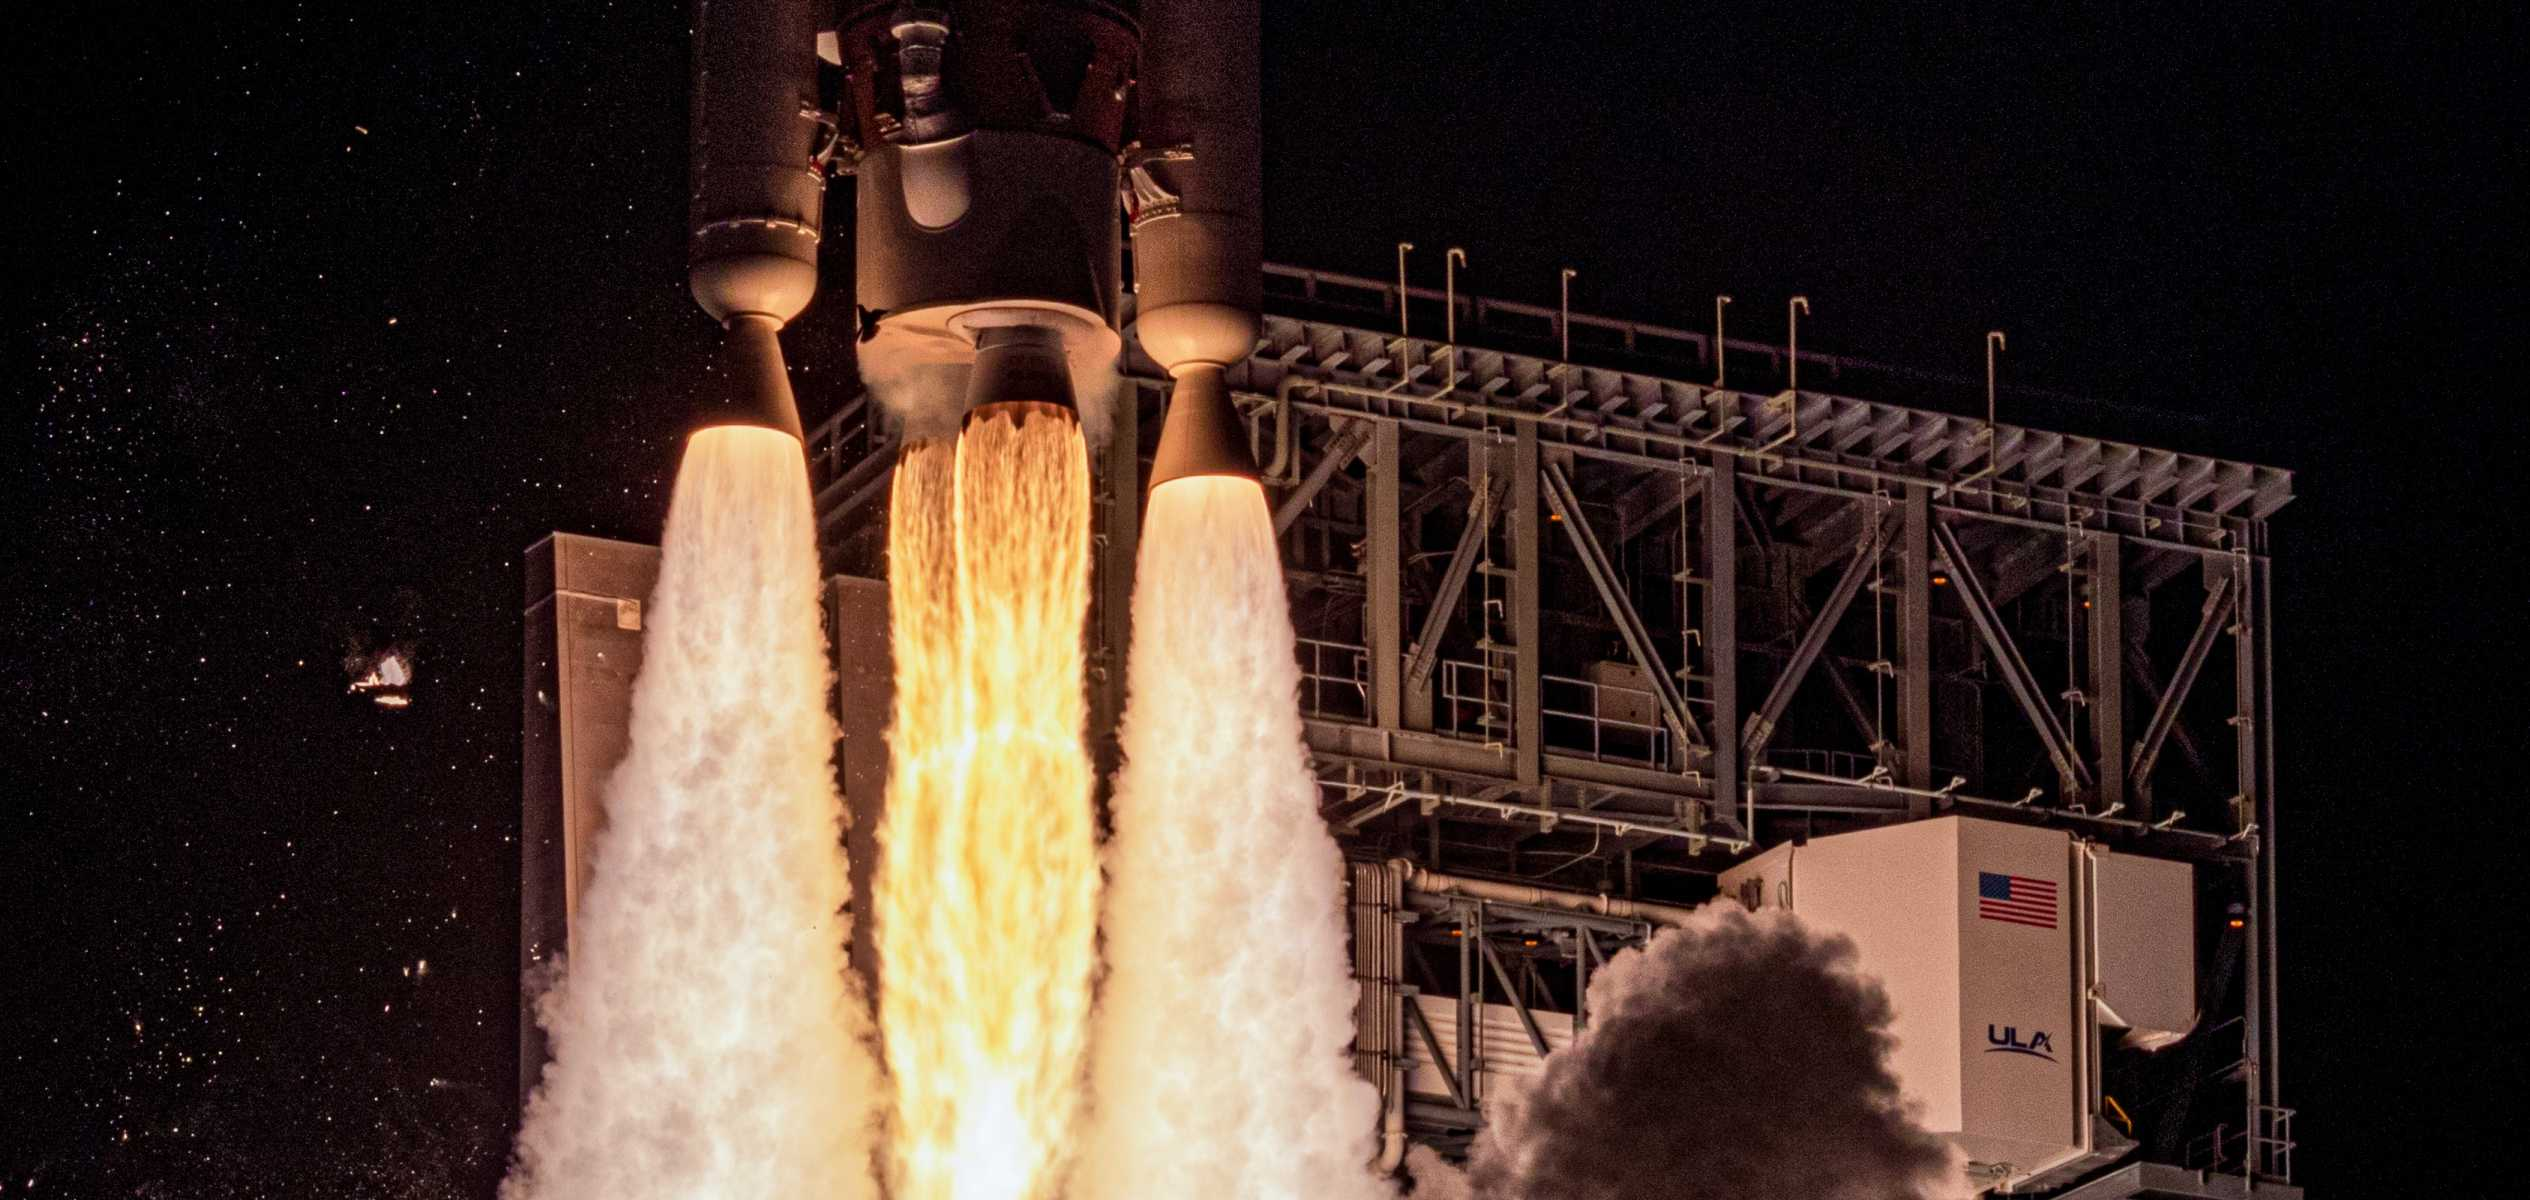 Starliner OFT Atlas V LC-41 122019 (Richard Angle) liftoff 1 crop (c)